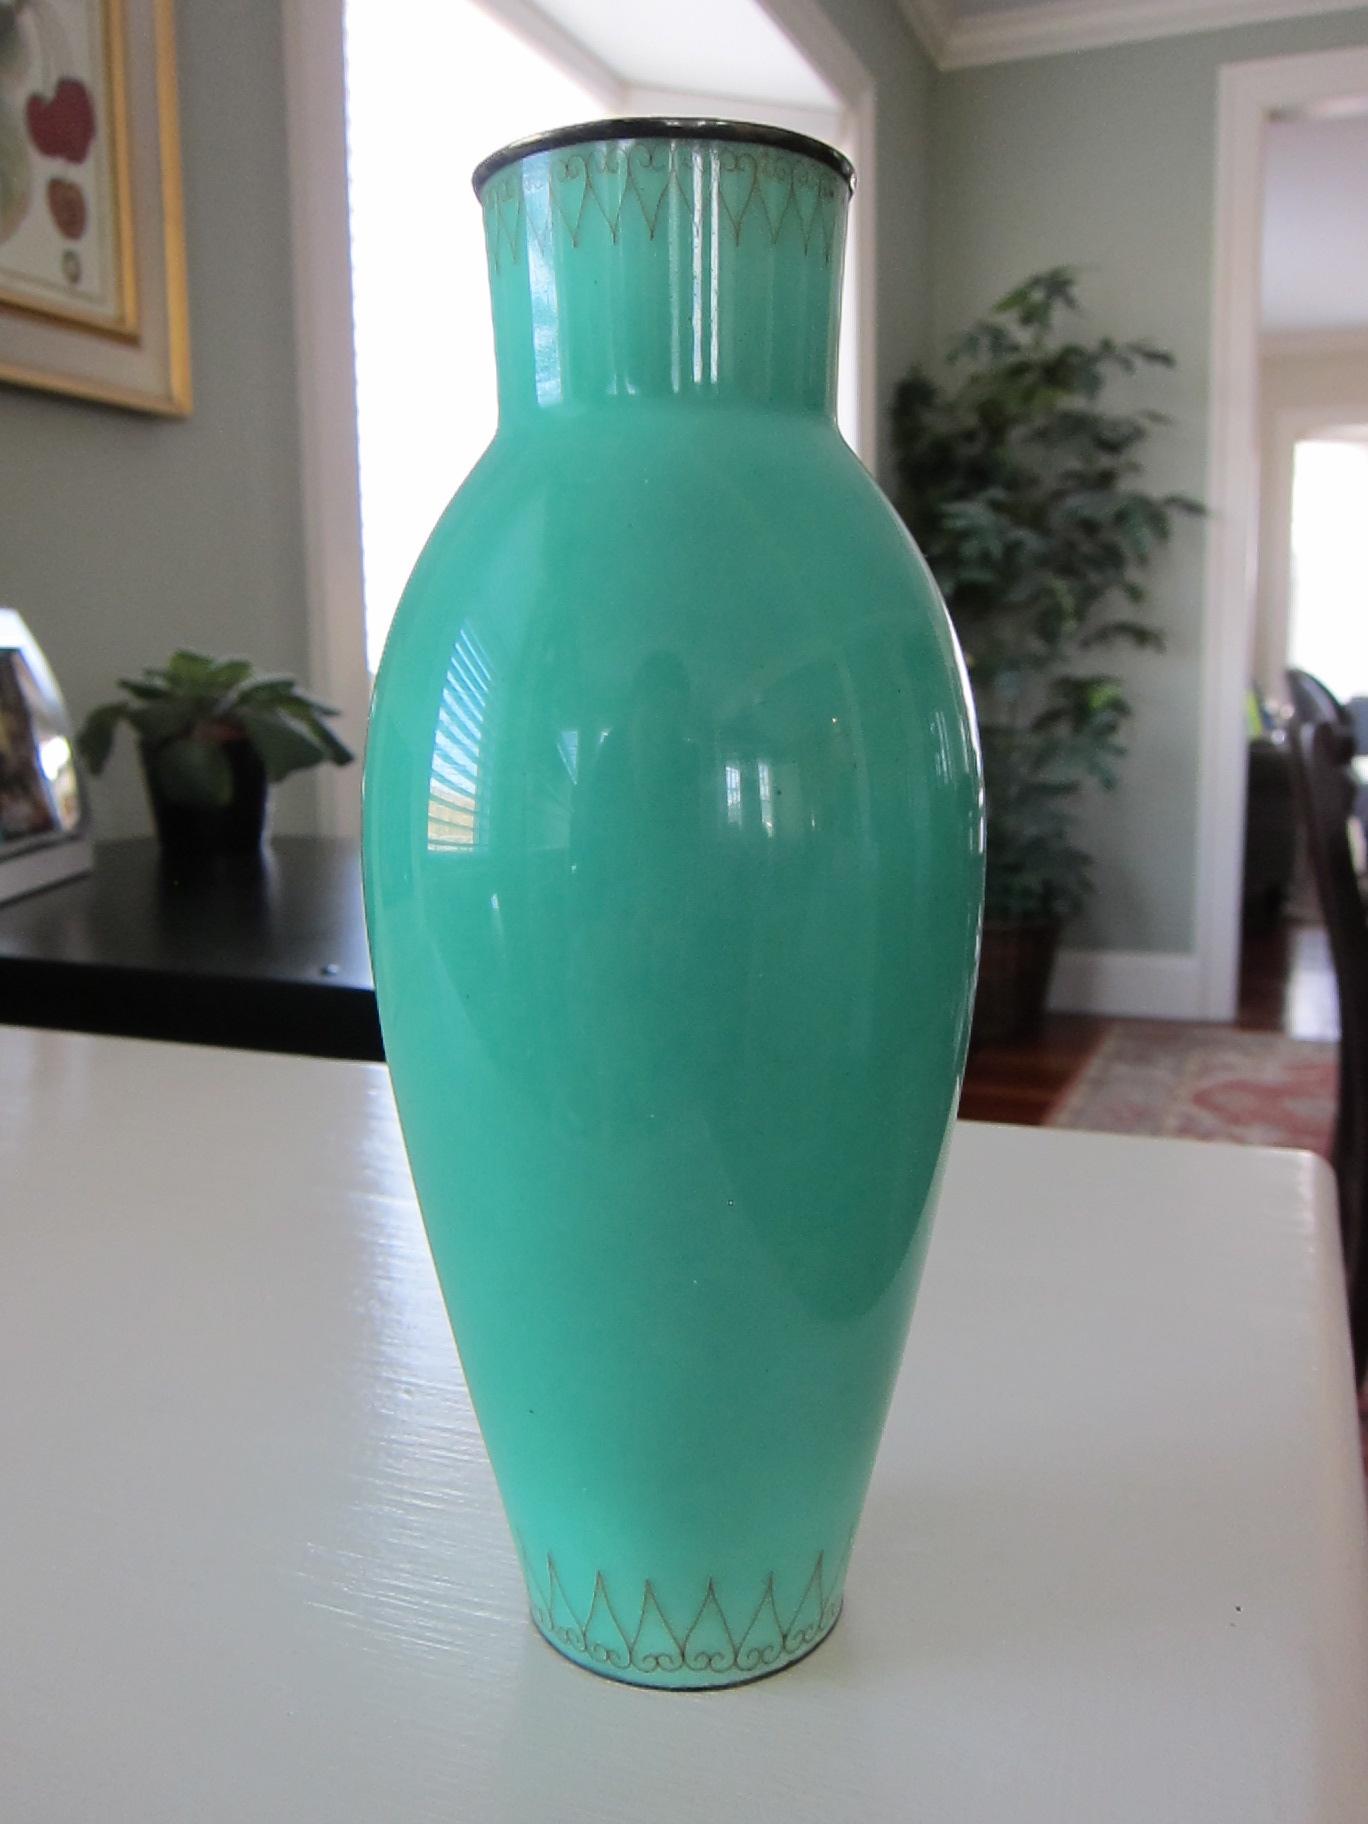 Green Ceramic Vase - Full View